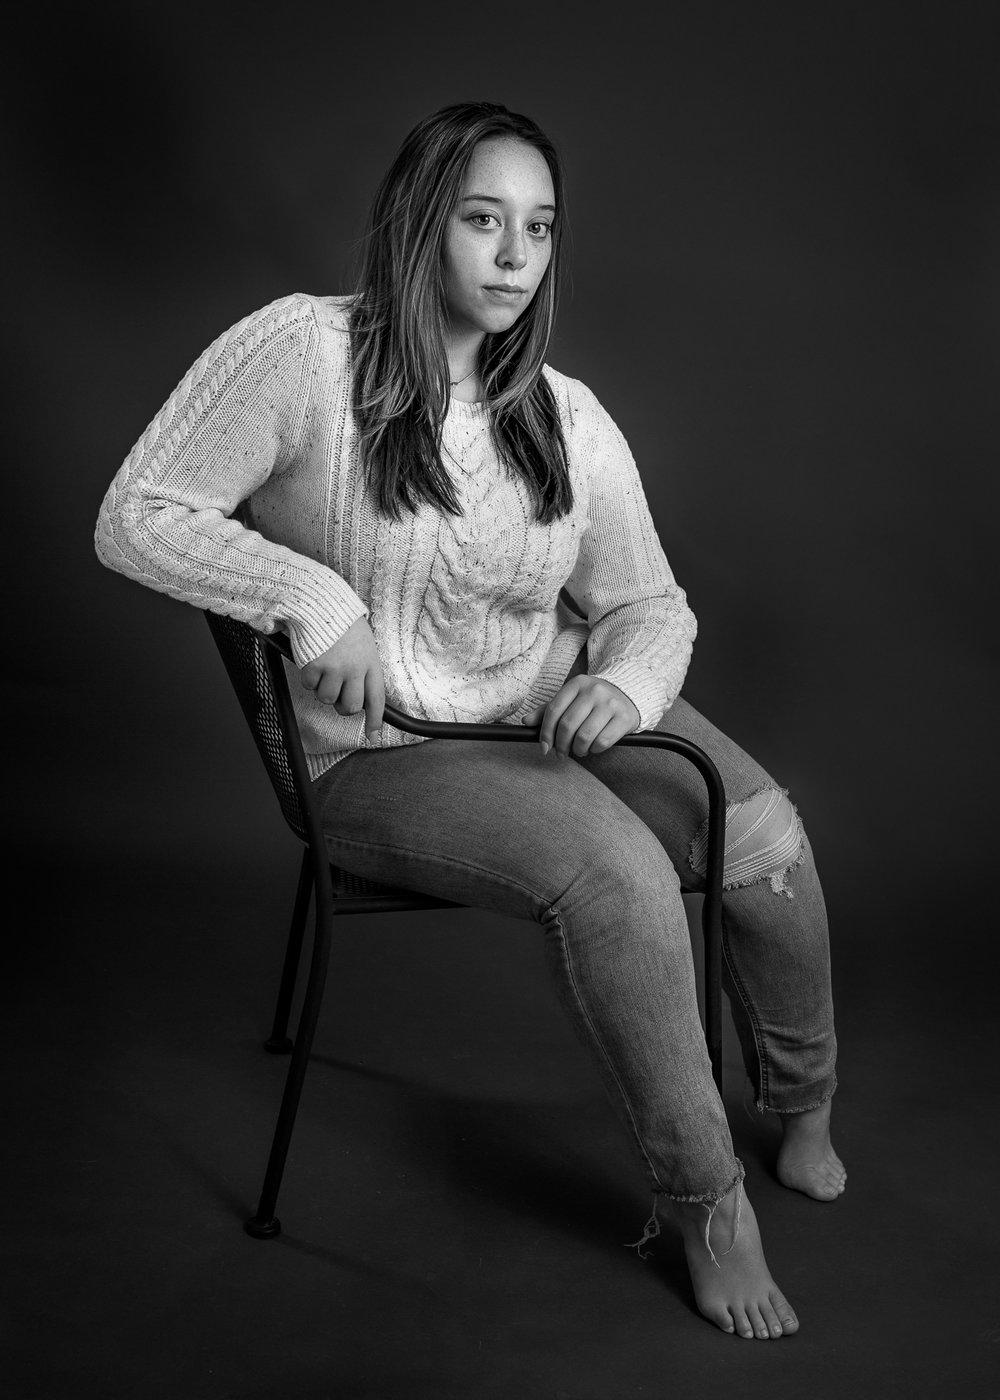 Portage-Michigan-Senior-Teen-Photographer-BEAUTY120818-121.jpg